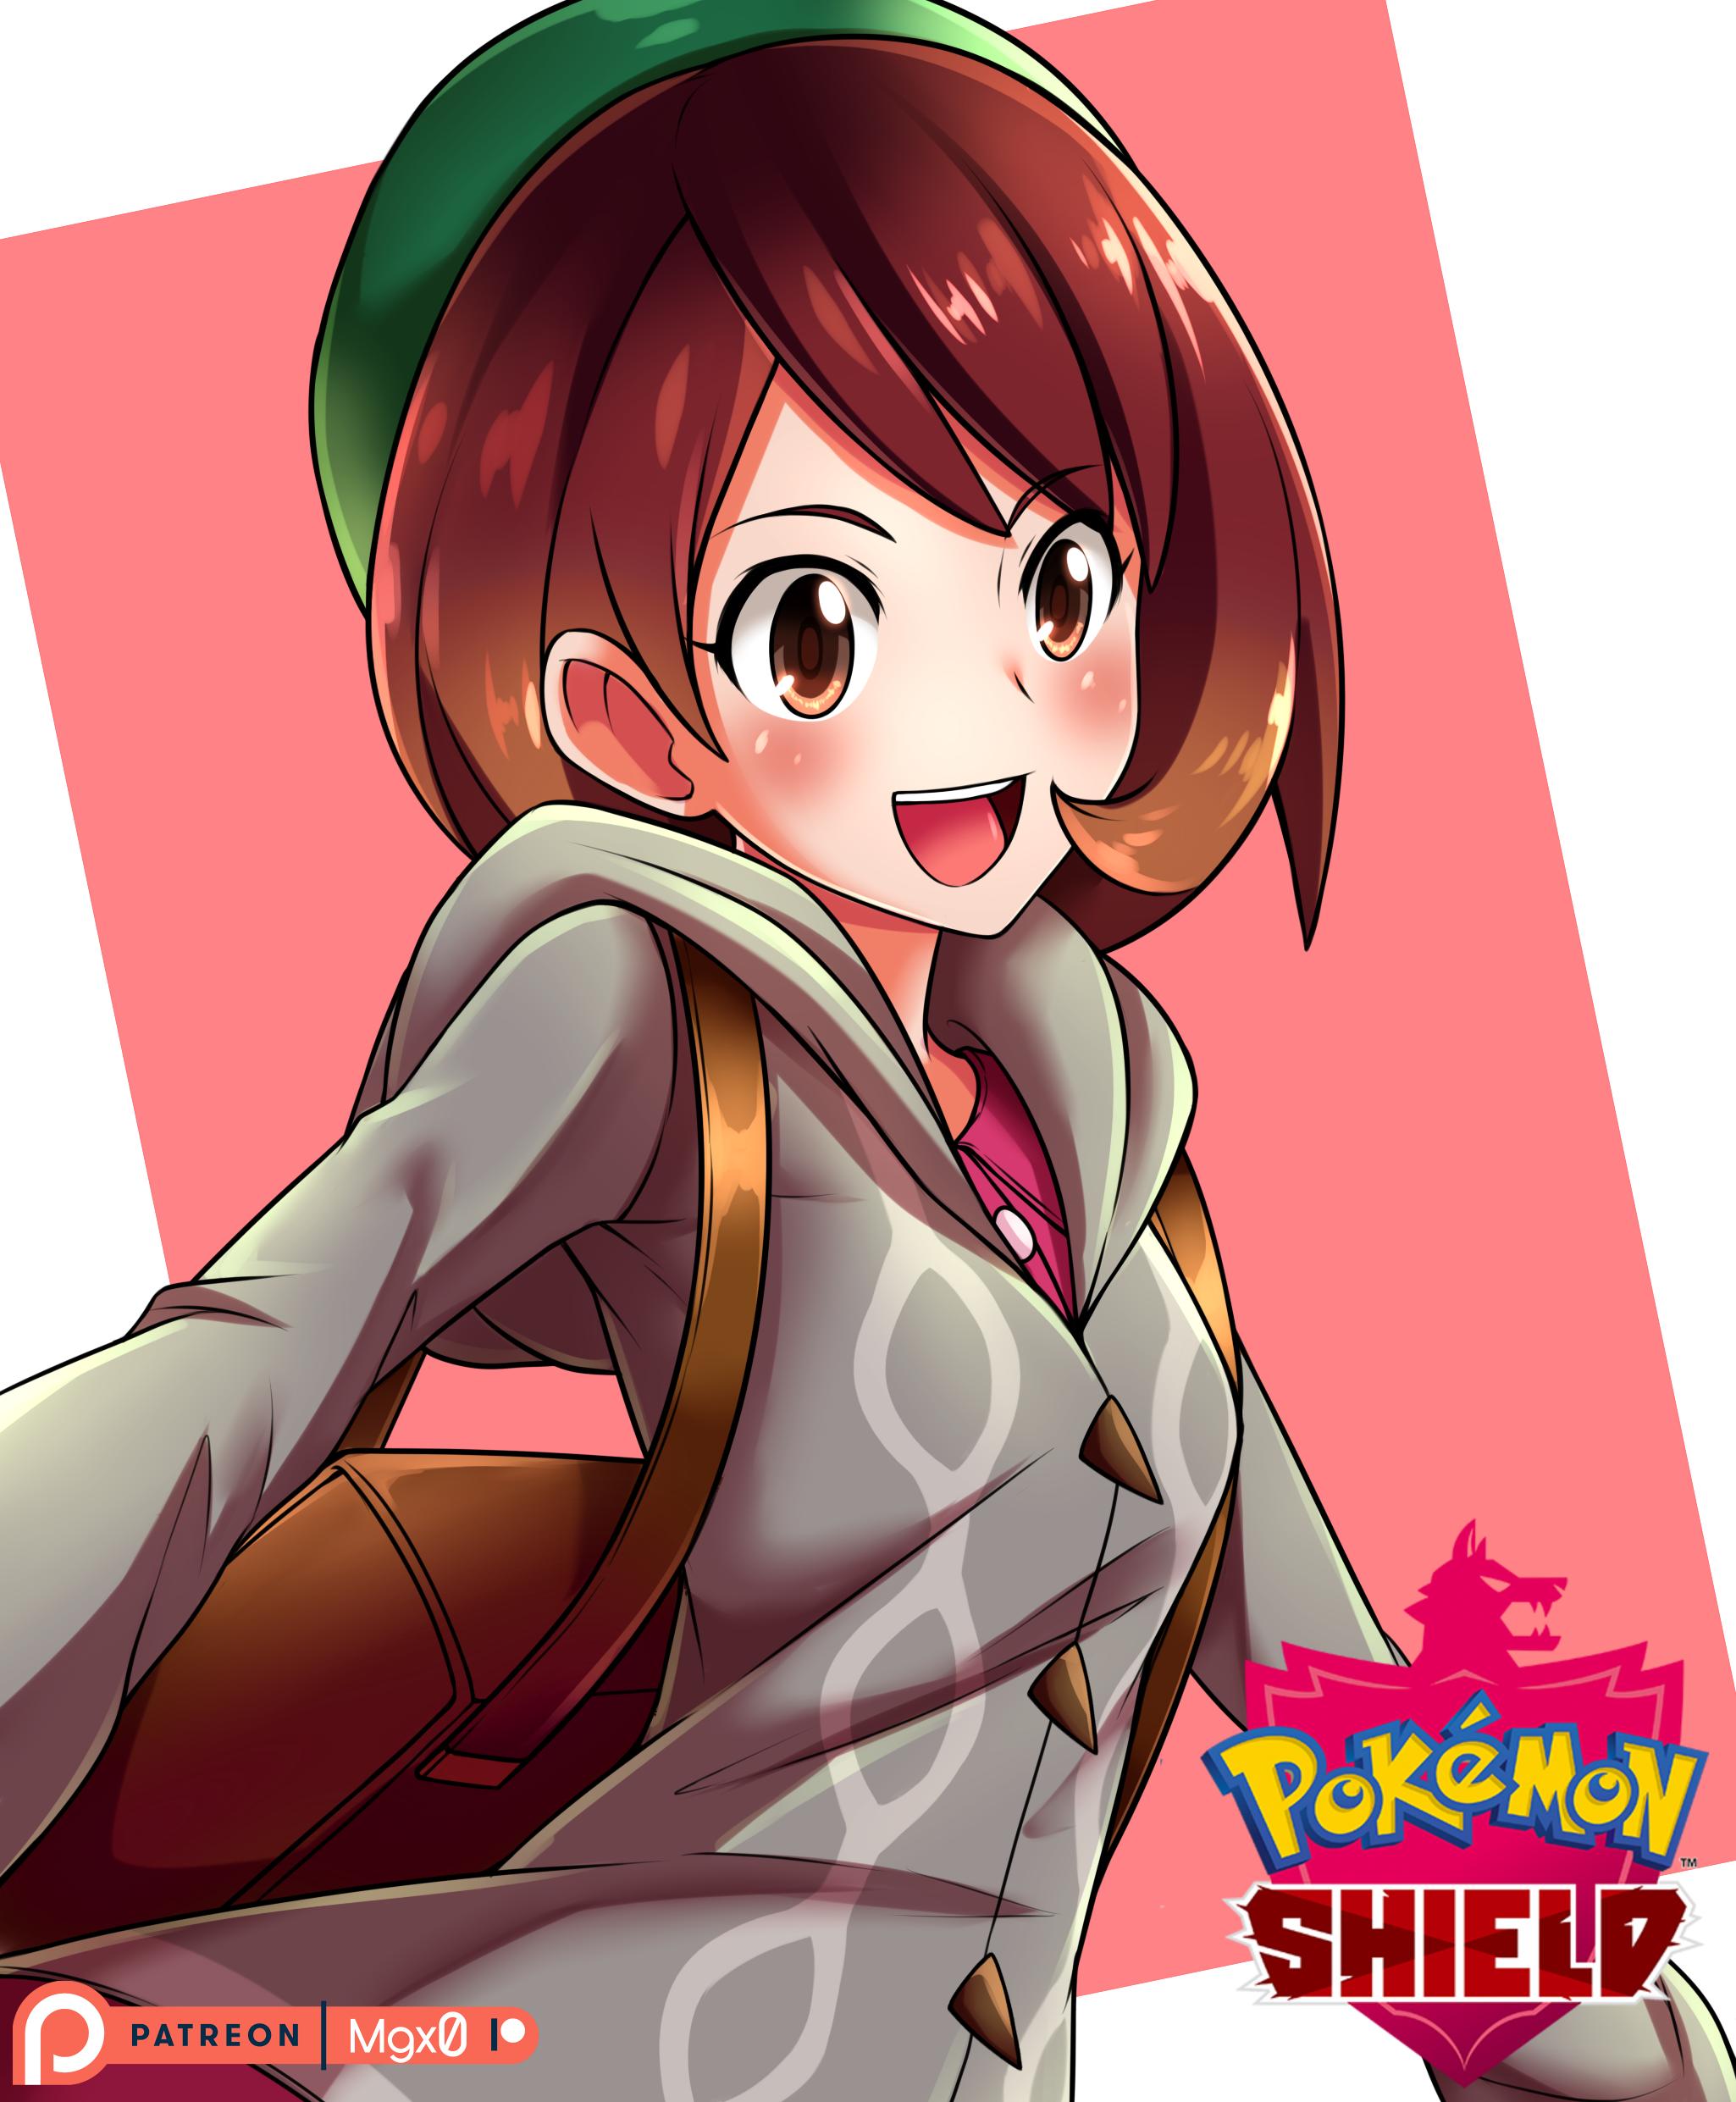 Pokemon Shield